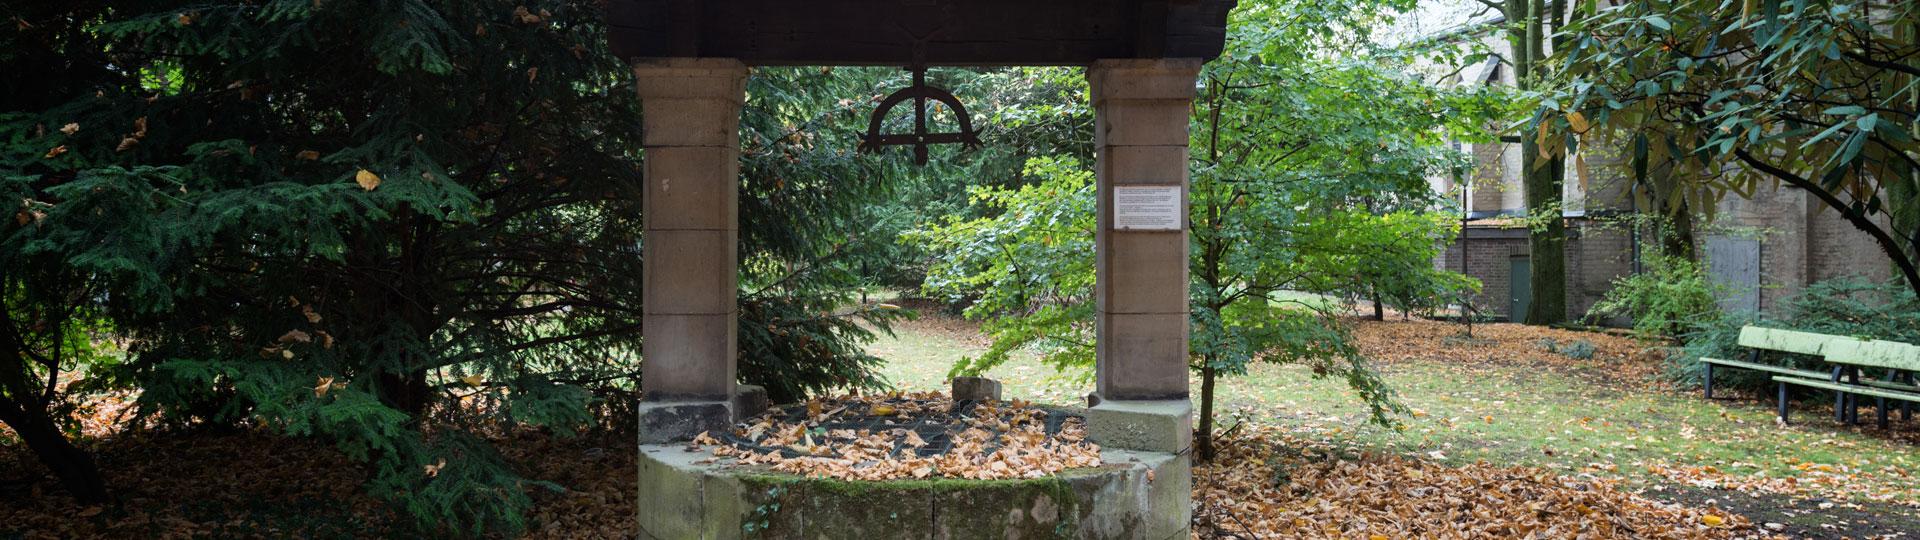 Foto Projekt Brunnenhof